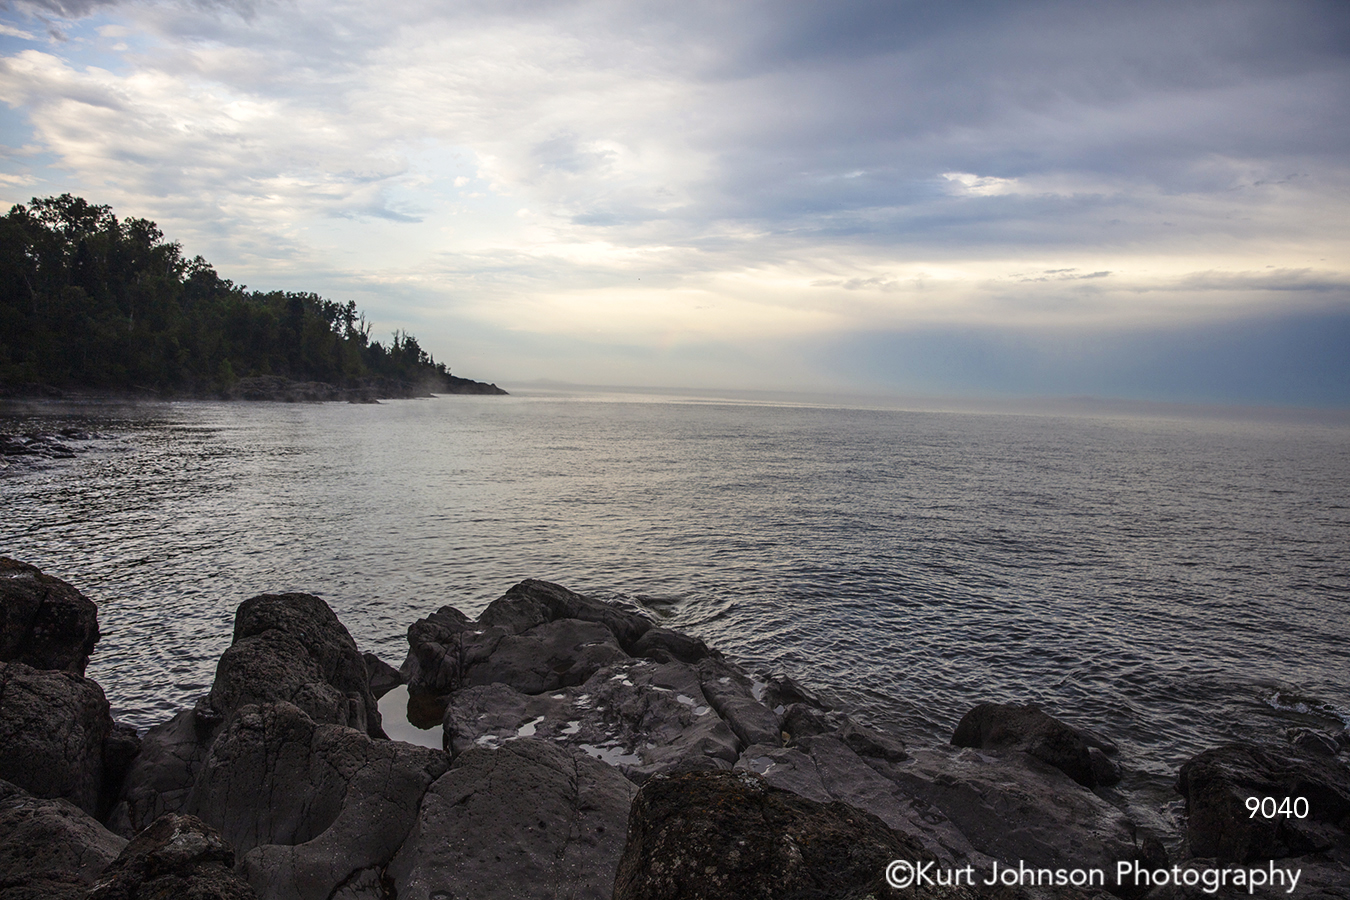 ocean water waves rock stone gray blue shore waterscape horizon clouds